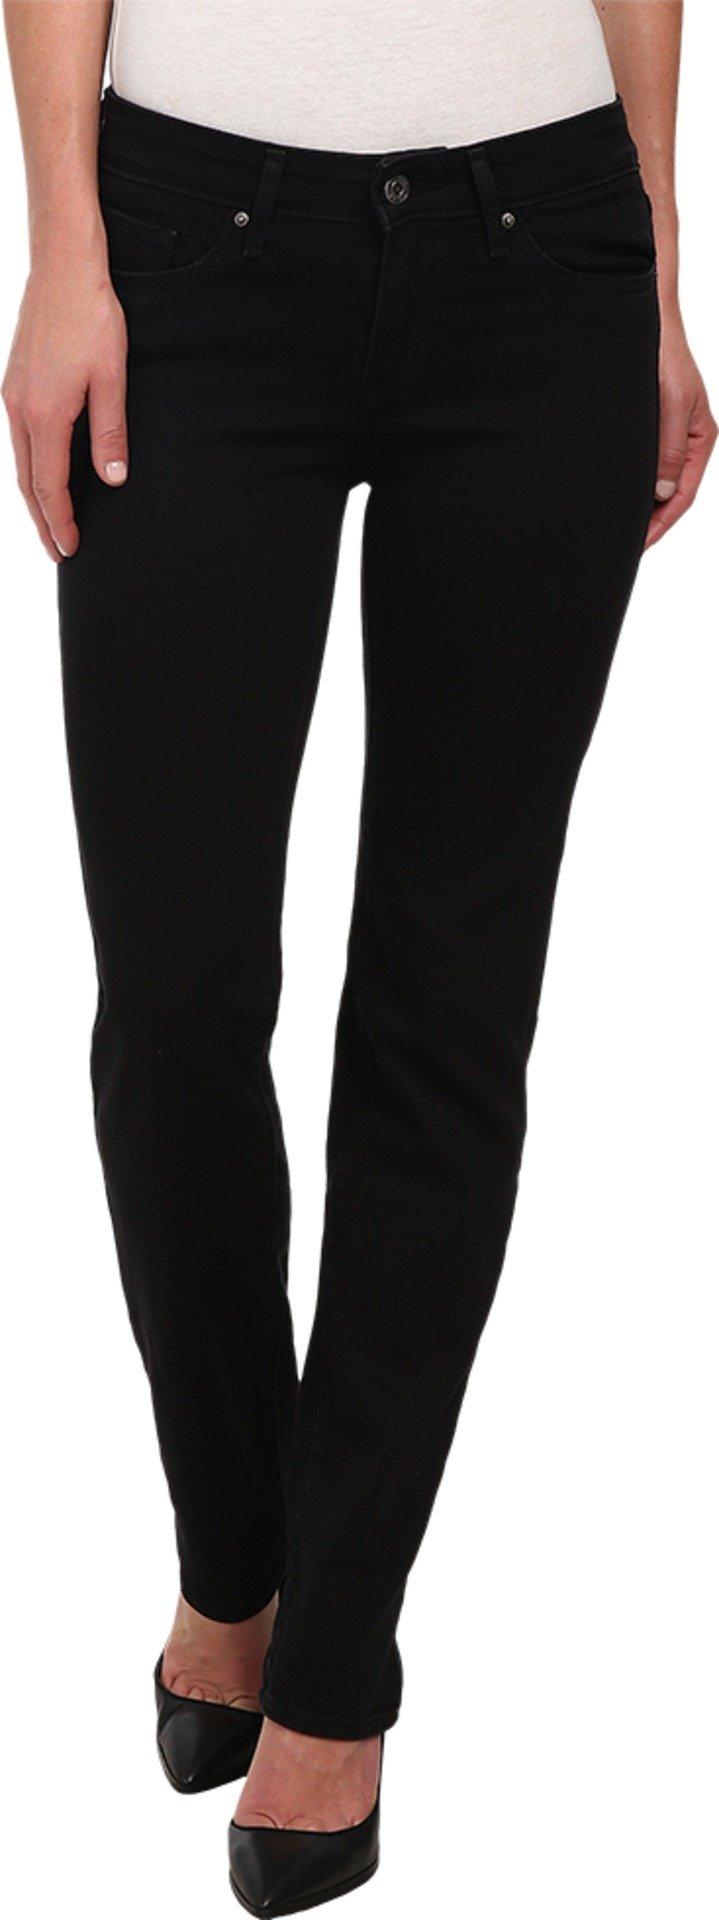 Levi's Women's 712 Slim Jeans, Soft Black, 30 (US 10) R